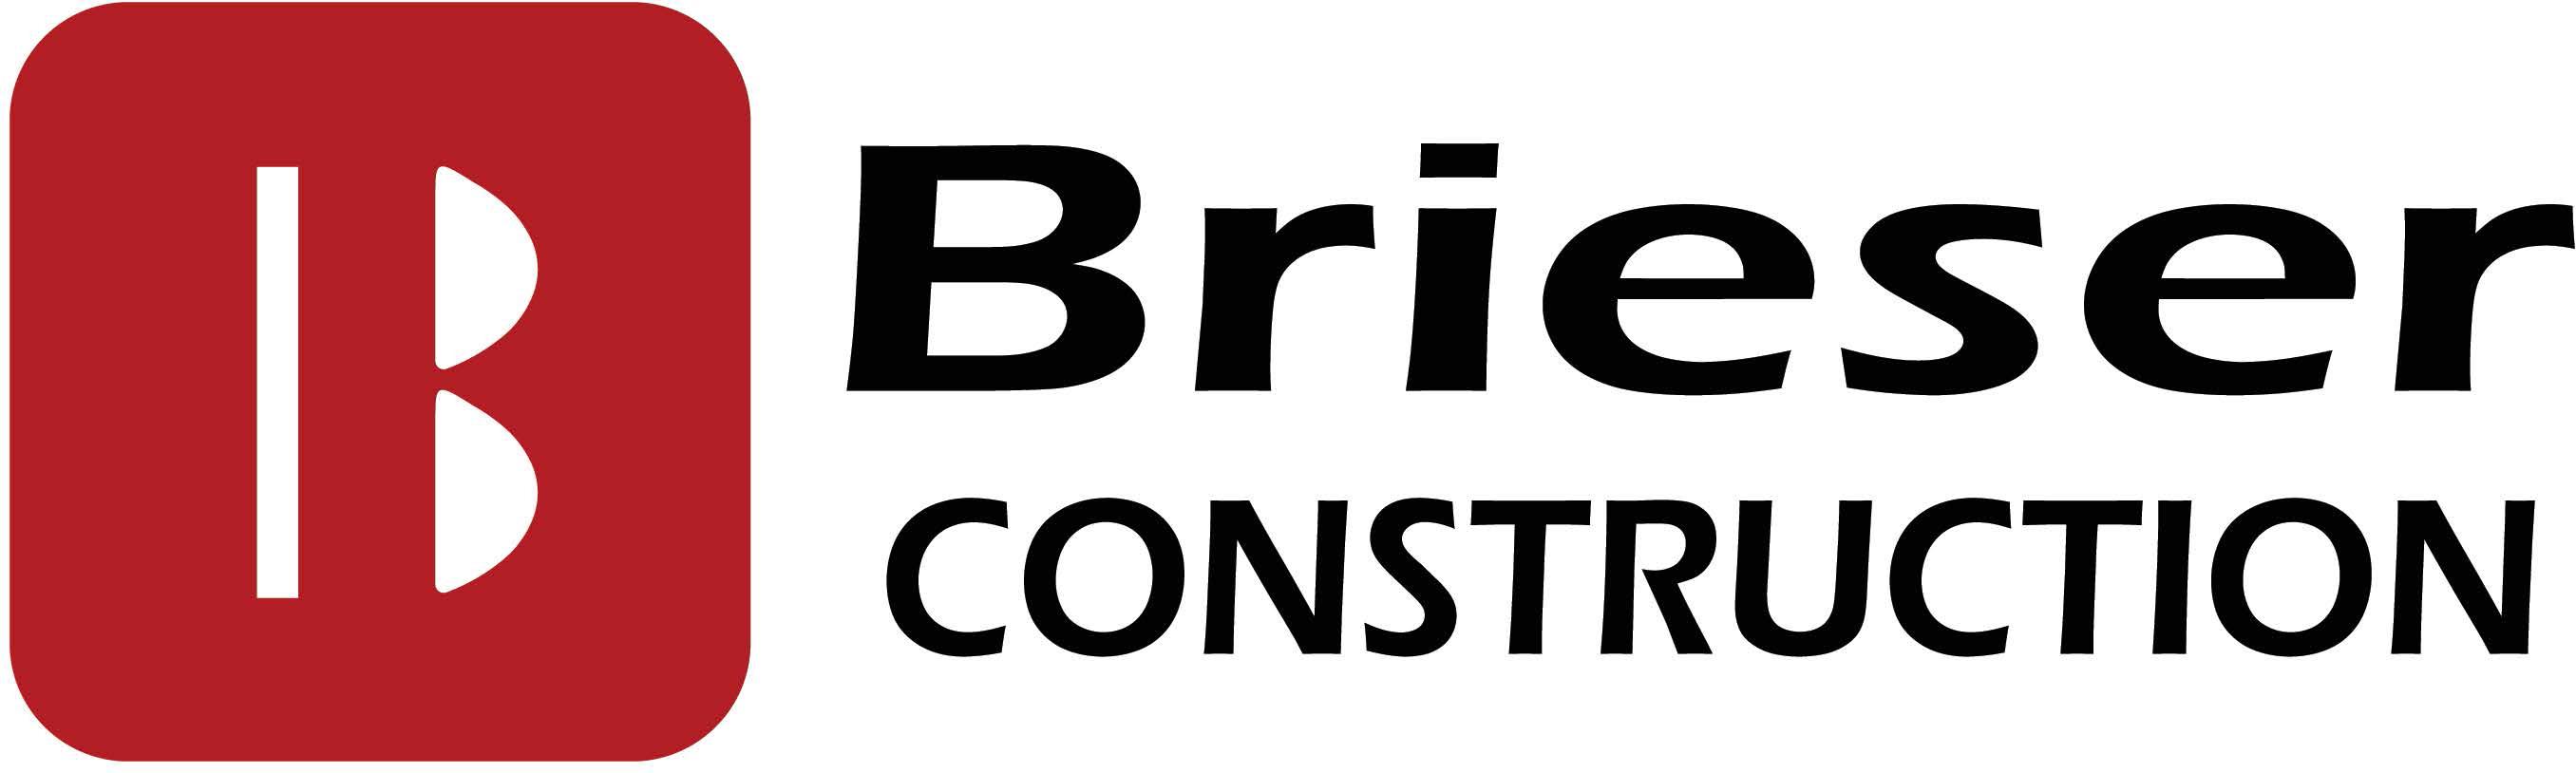 Brieser Construction